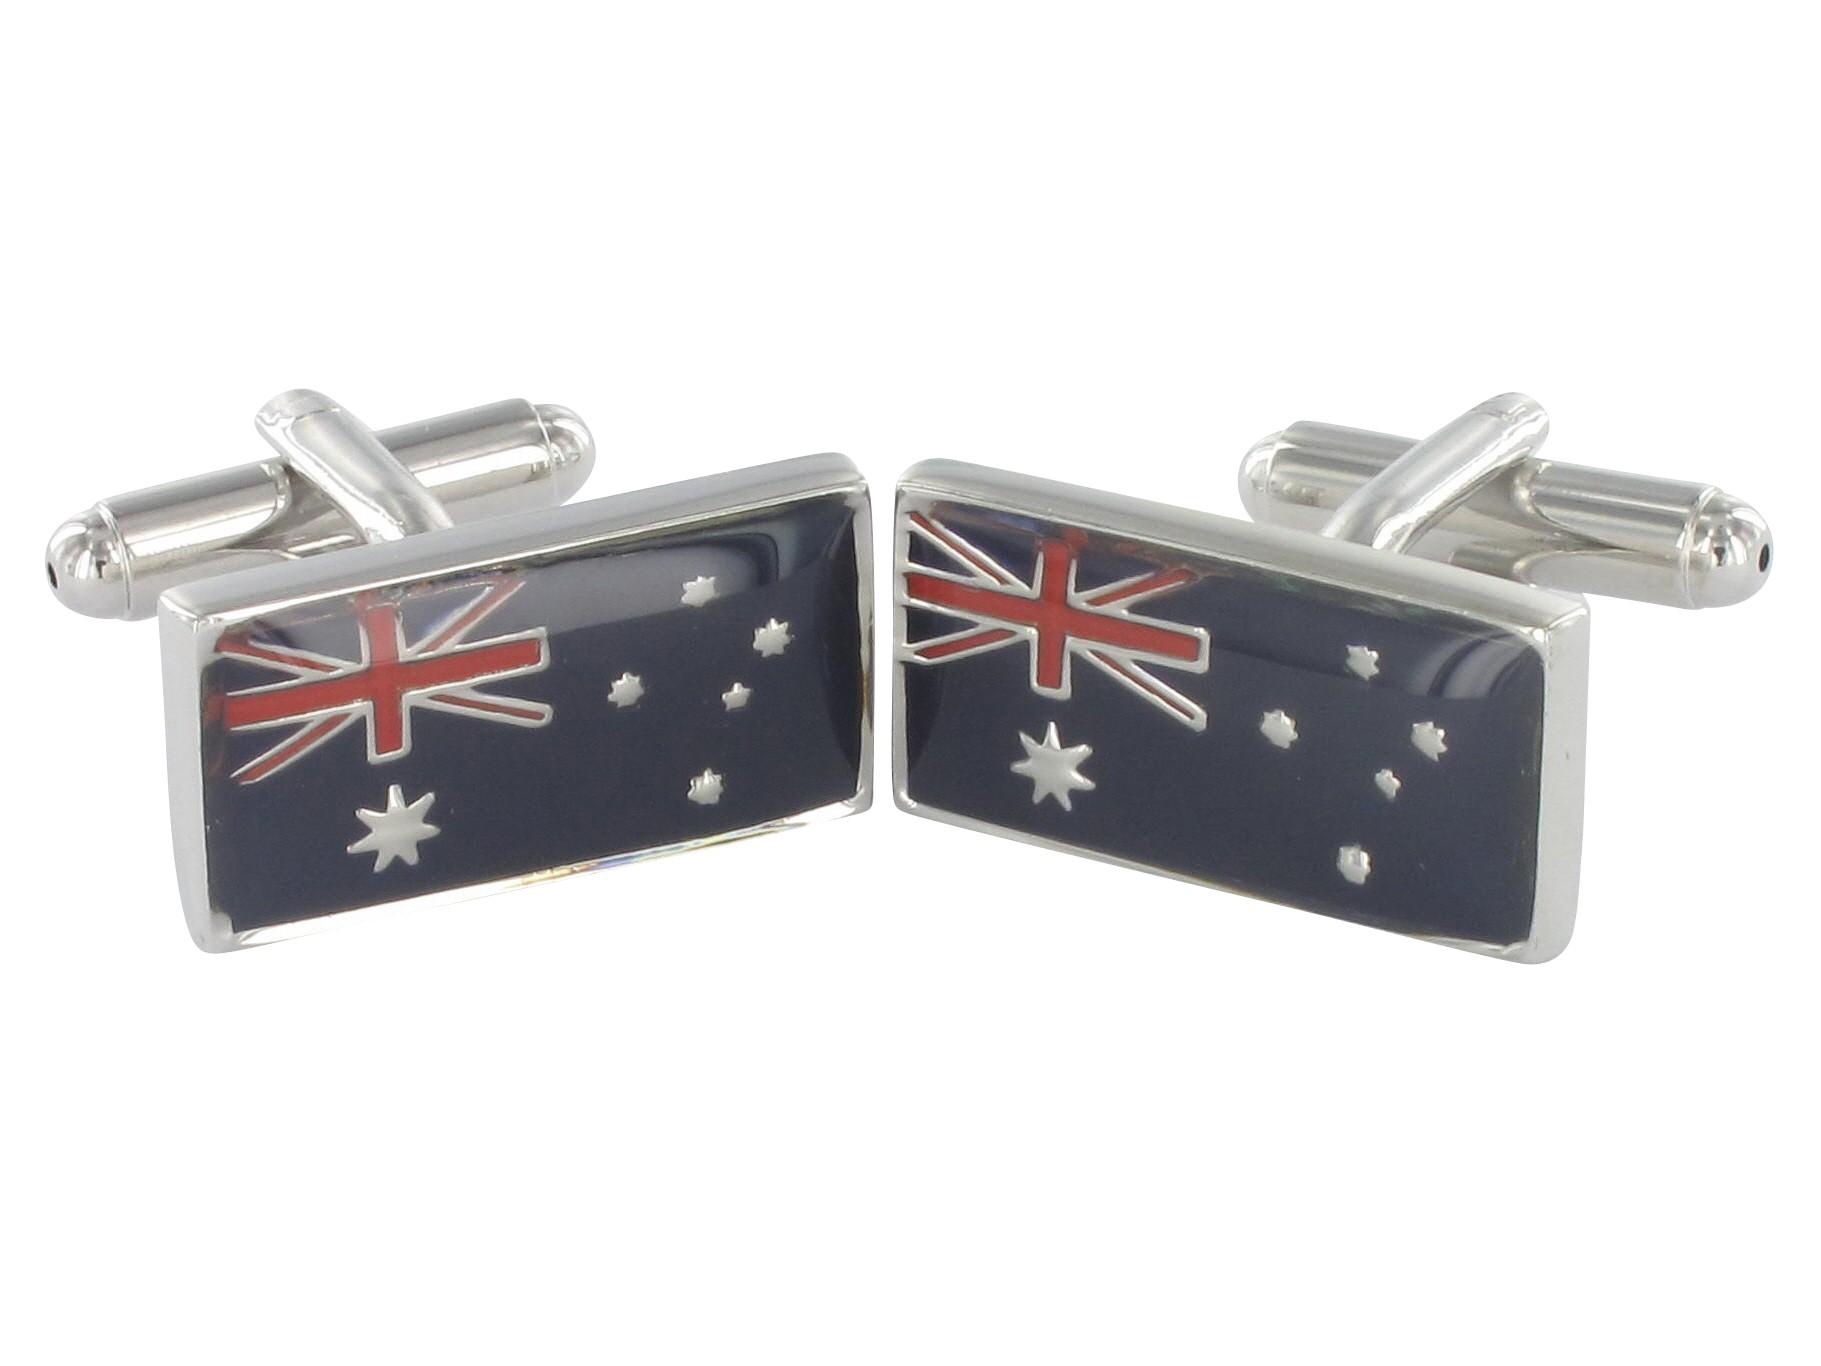 TEROON Manschettenknöpfe Australienflagge